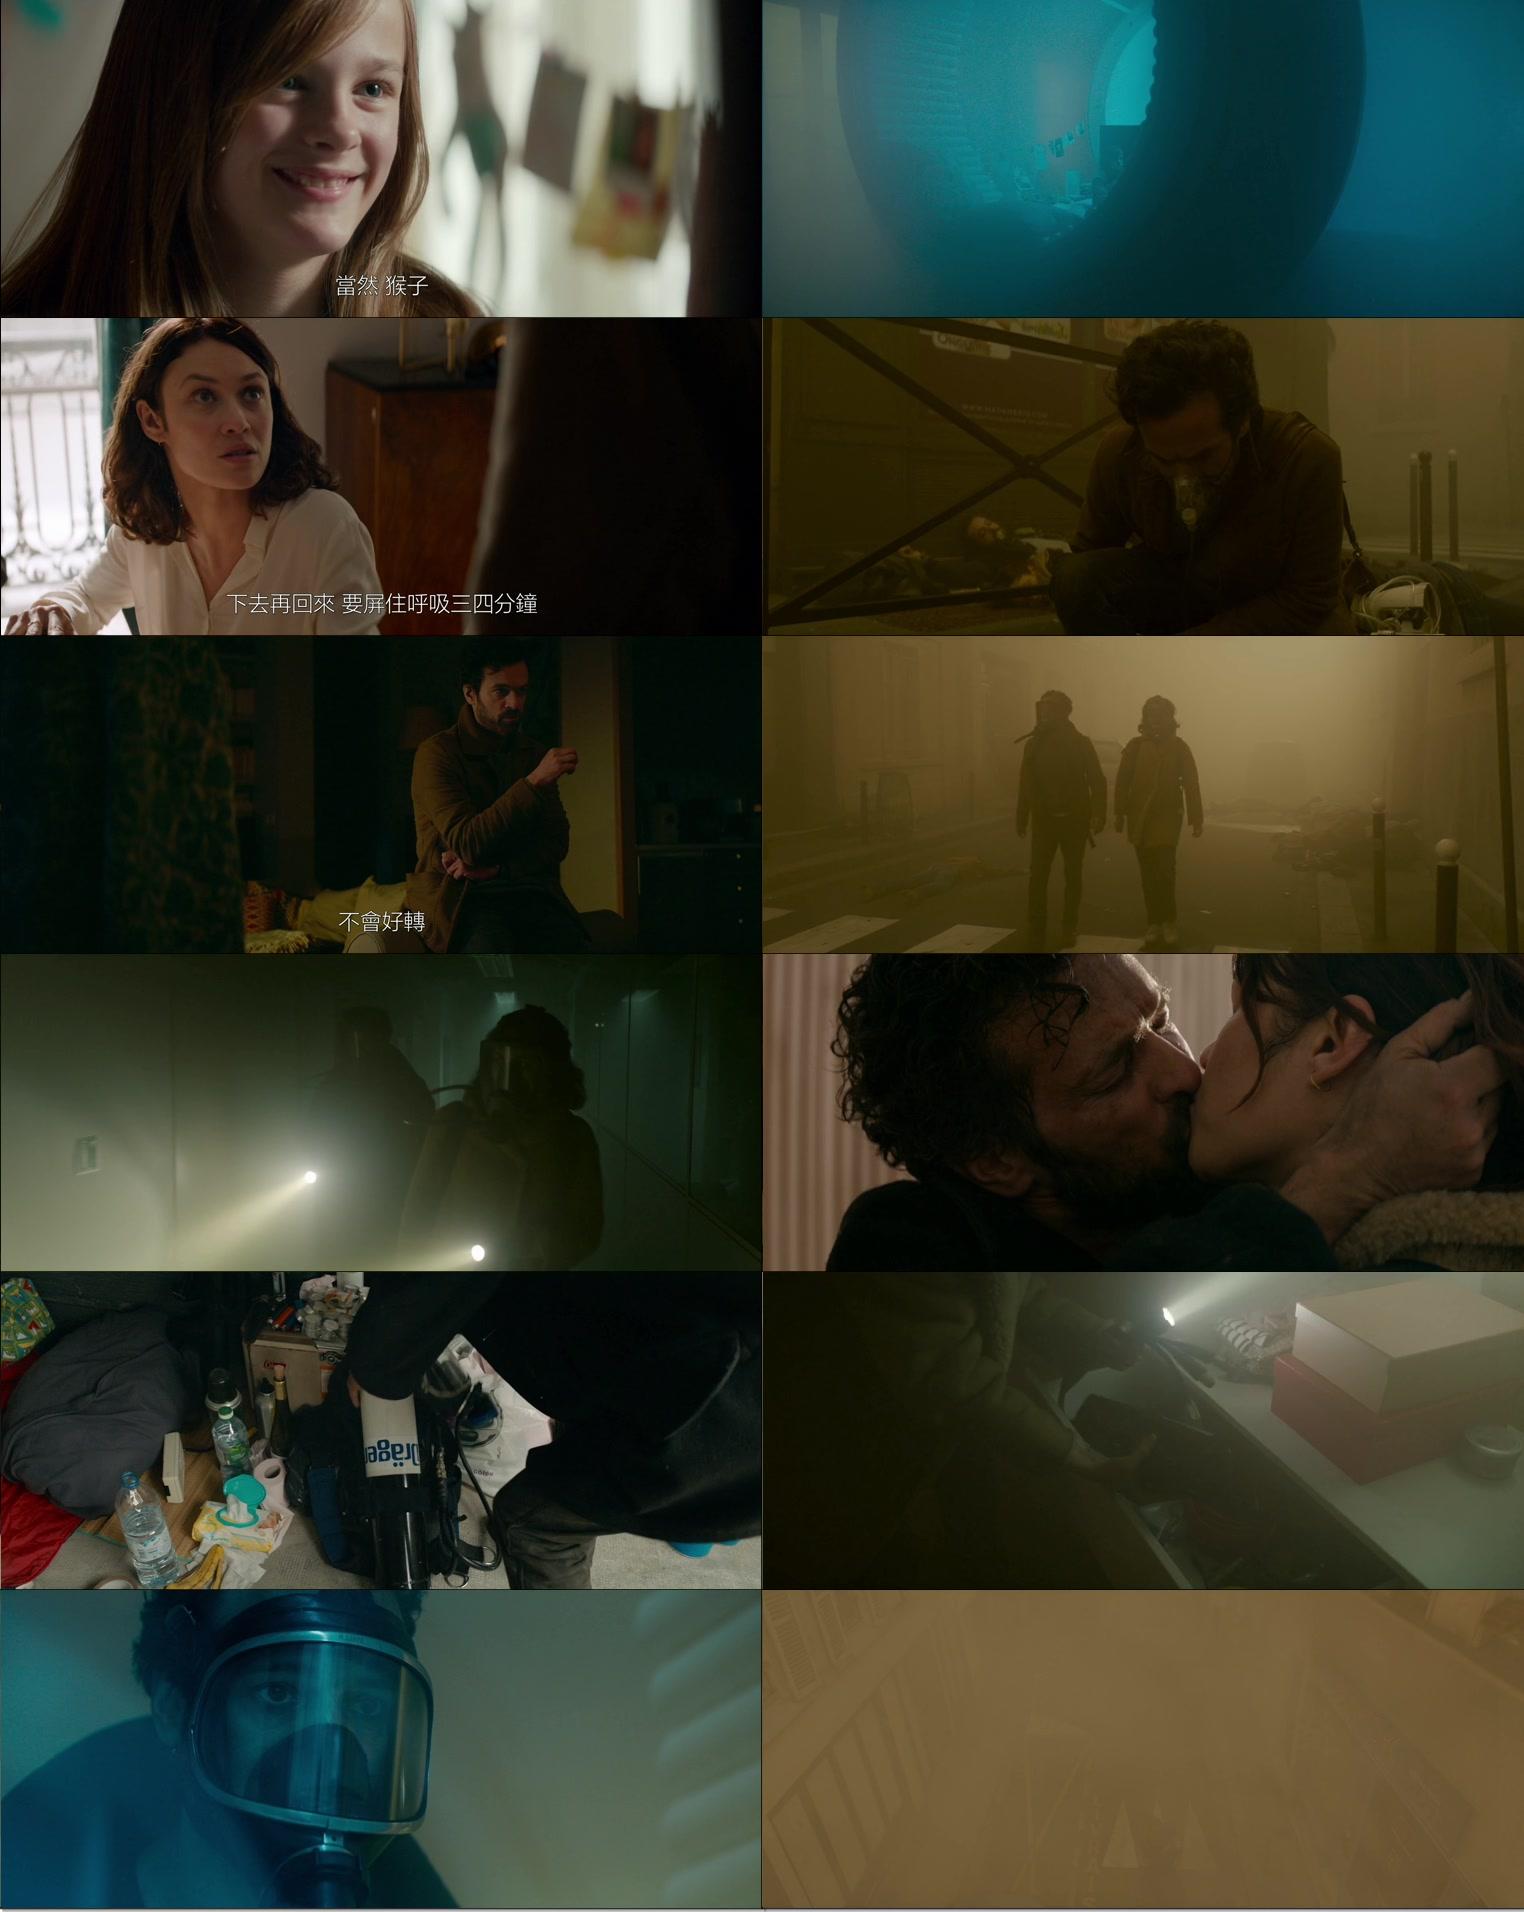 Dans.La.Brume.2018.FRENCH.1080p.BluRay.x264-FEWAT.mkv